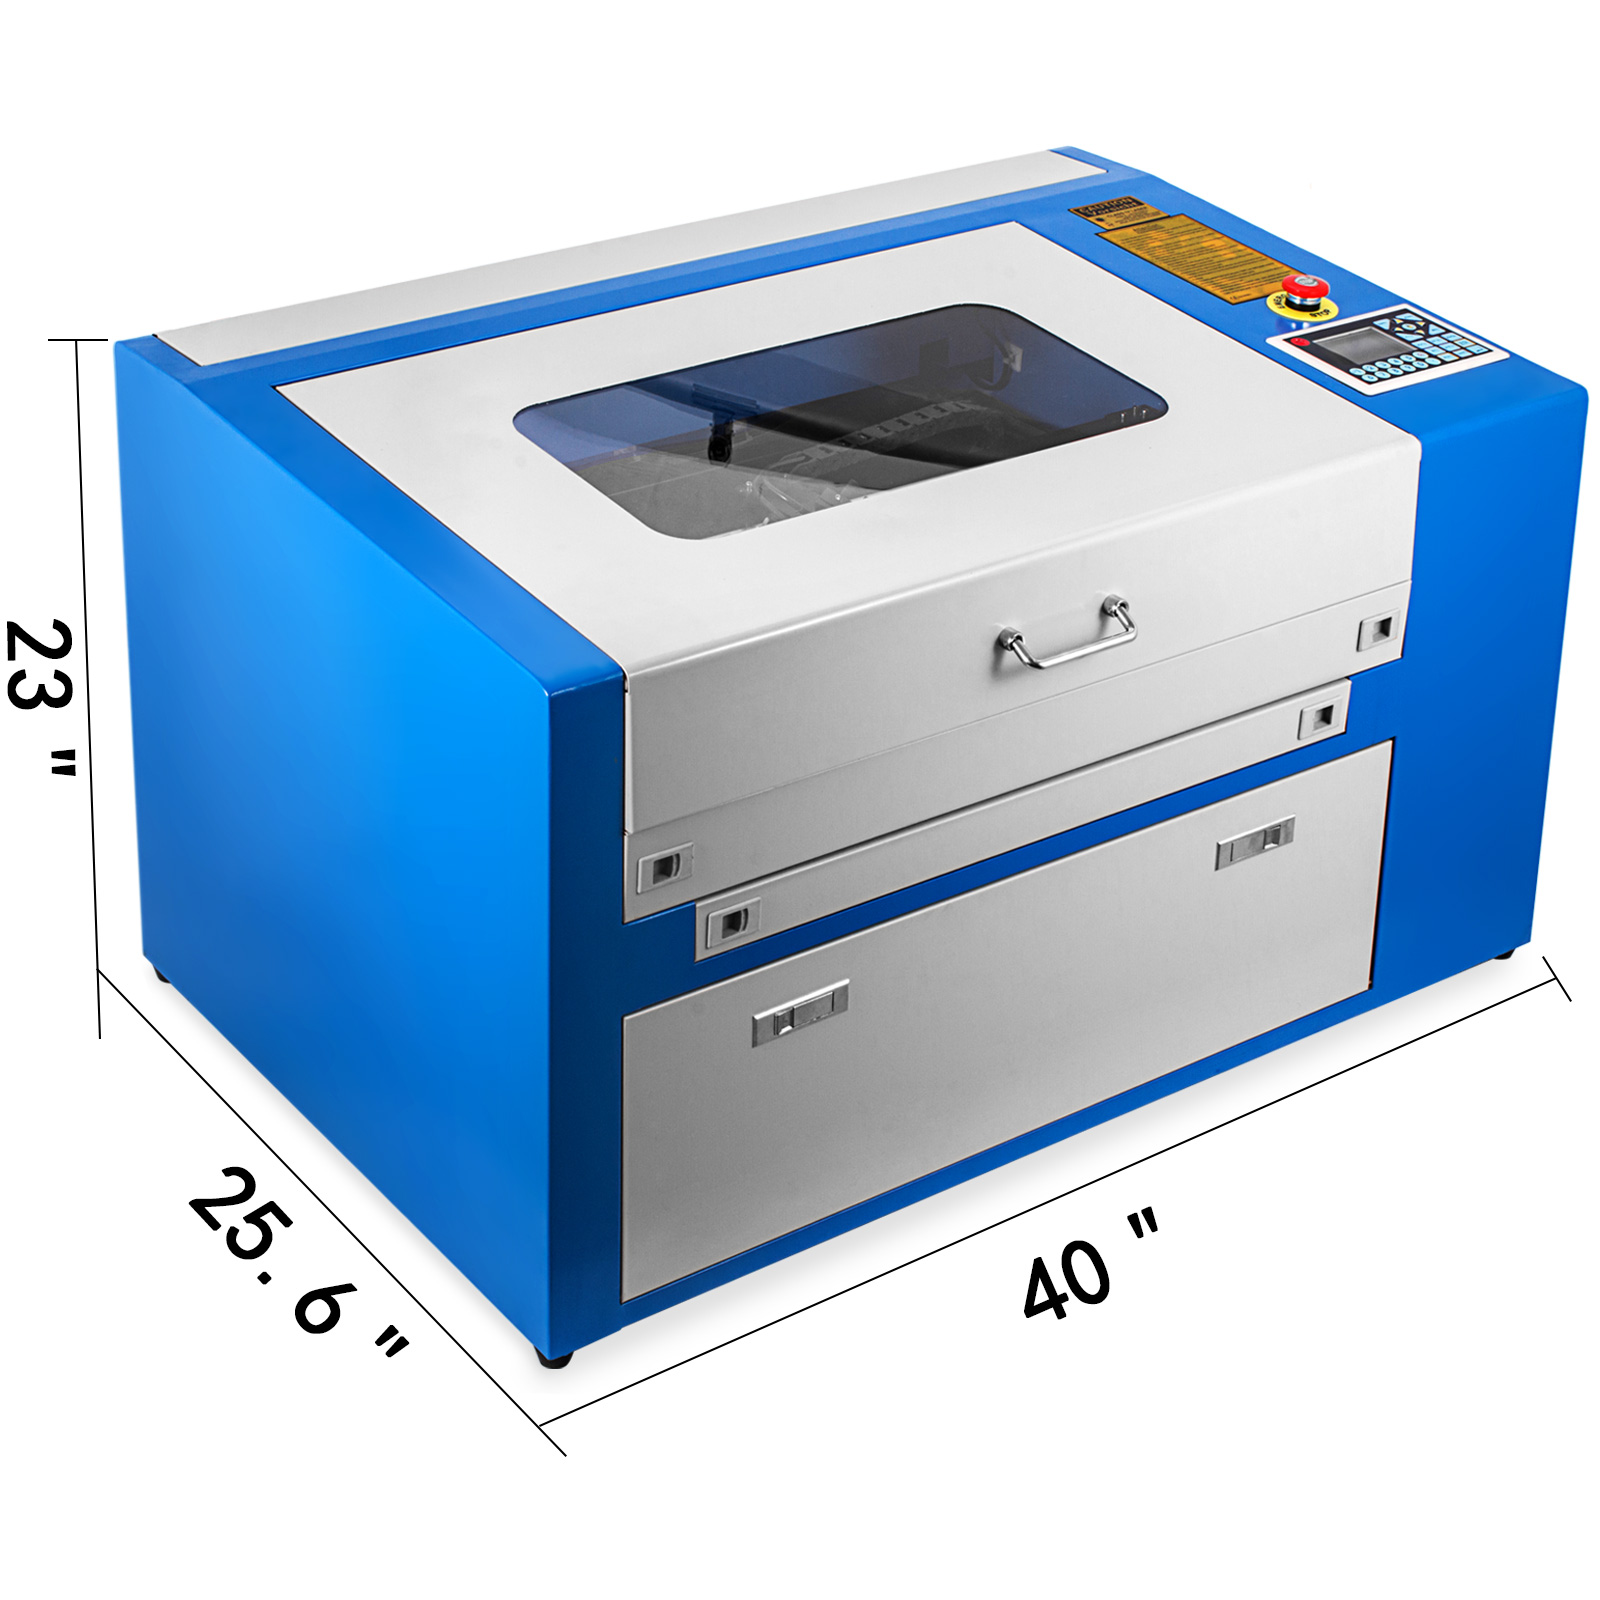 Macchina-per-Incisione-Laser-CO2-40-130W-Asse-Rotante-Tagliatrice-Incisore miniatura 26